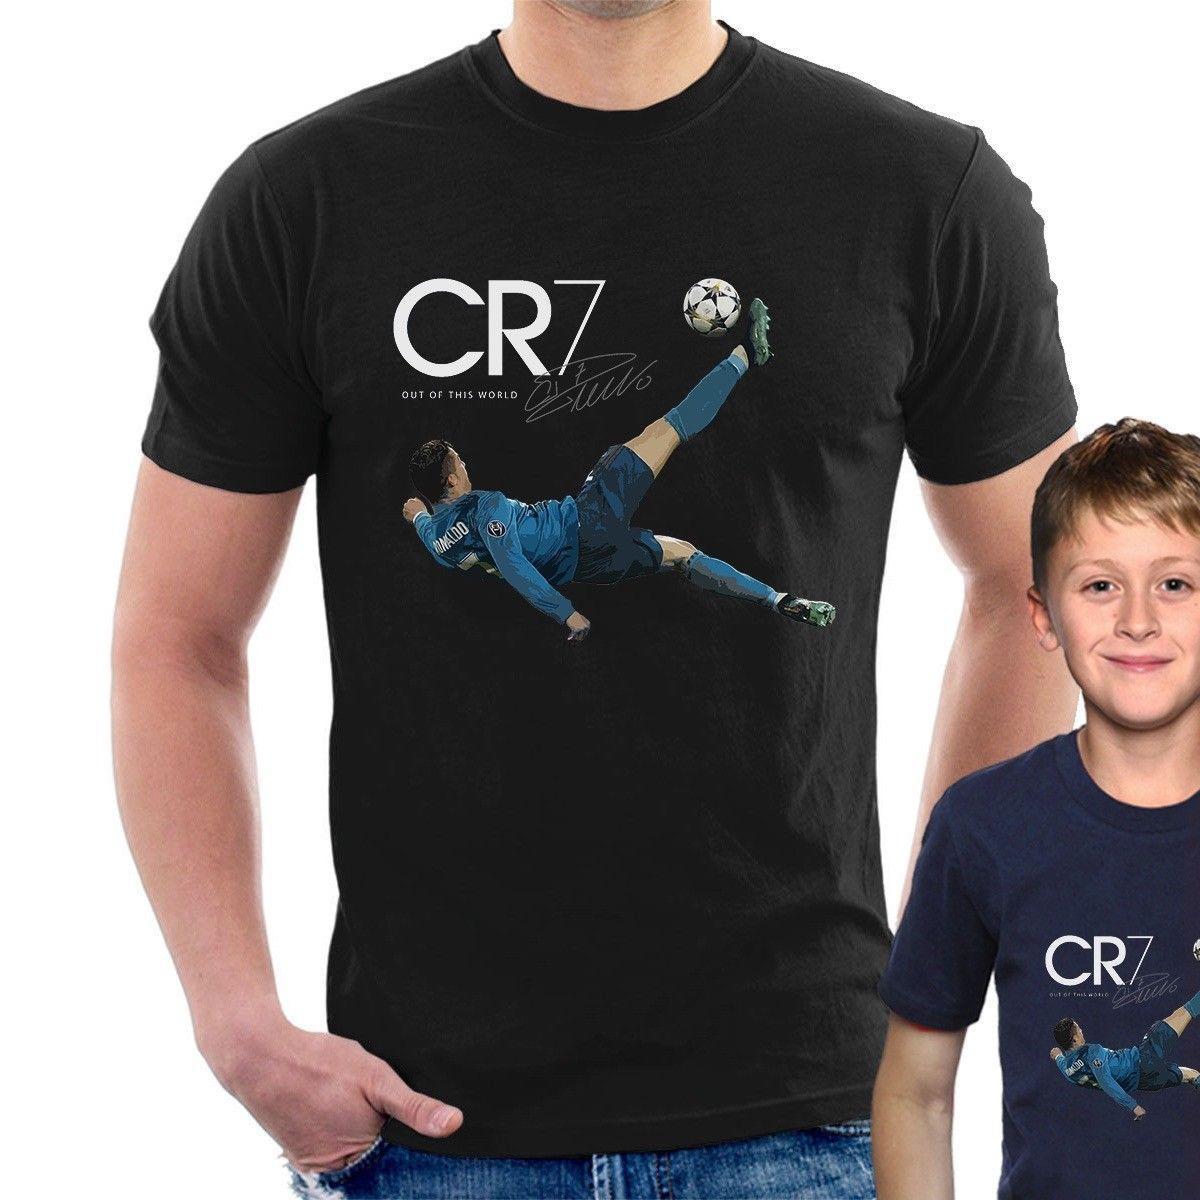 Cr7 Bicycle Kick Goal T Shirt Cristiano Ronaldo Adult Kids Sizes Cool Casual Pride T Shirt Men Unisex New Fashion Tshirt